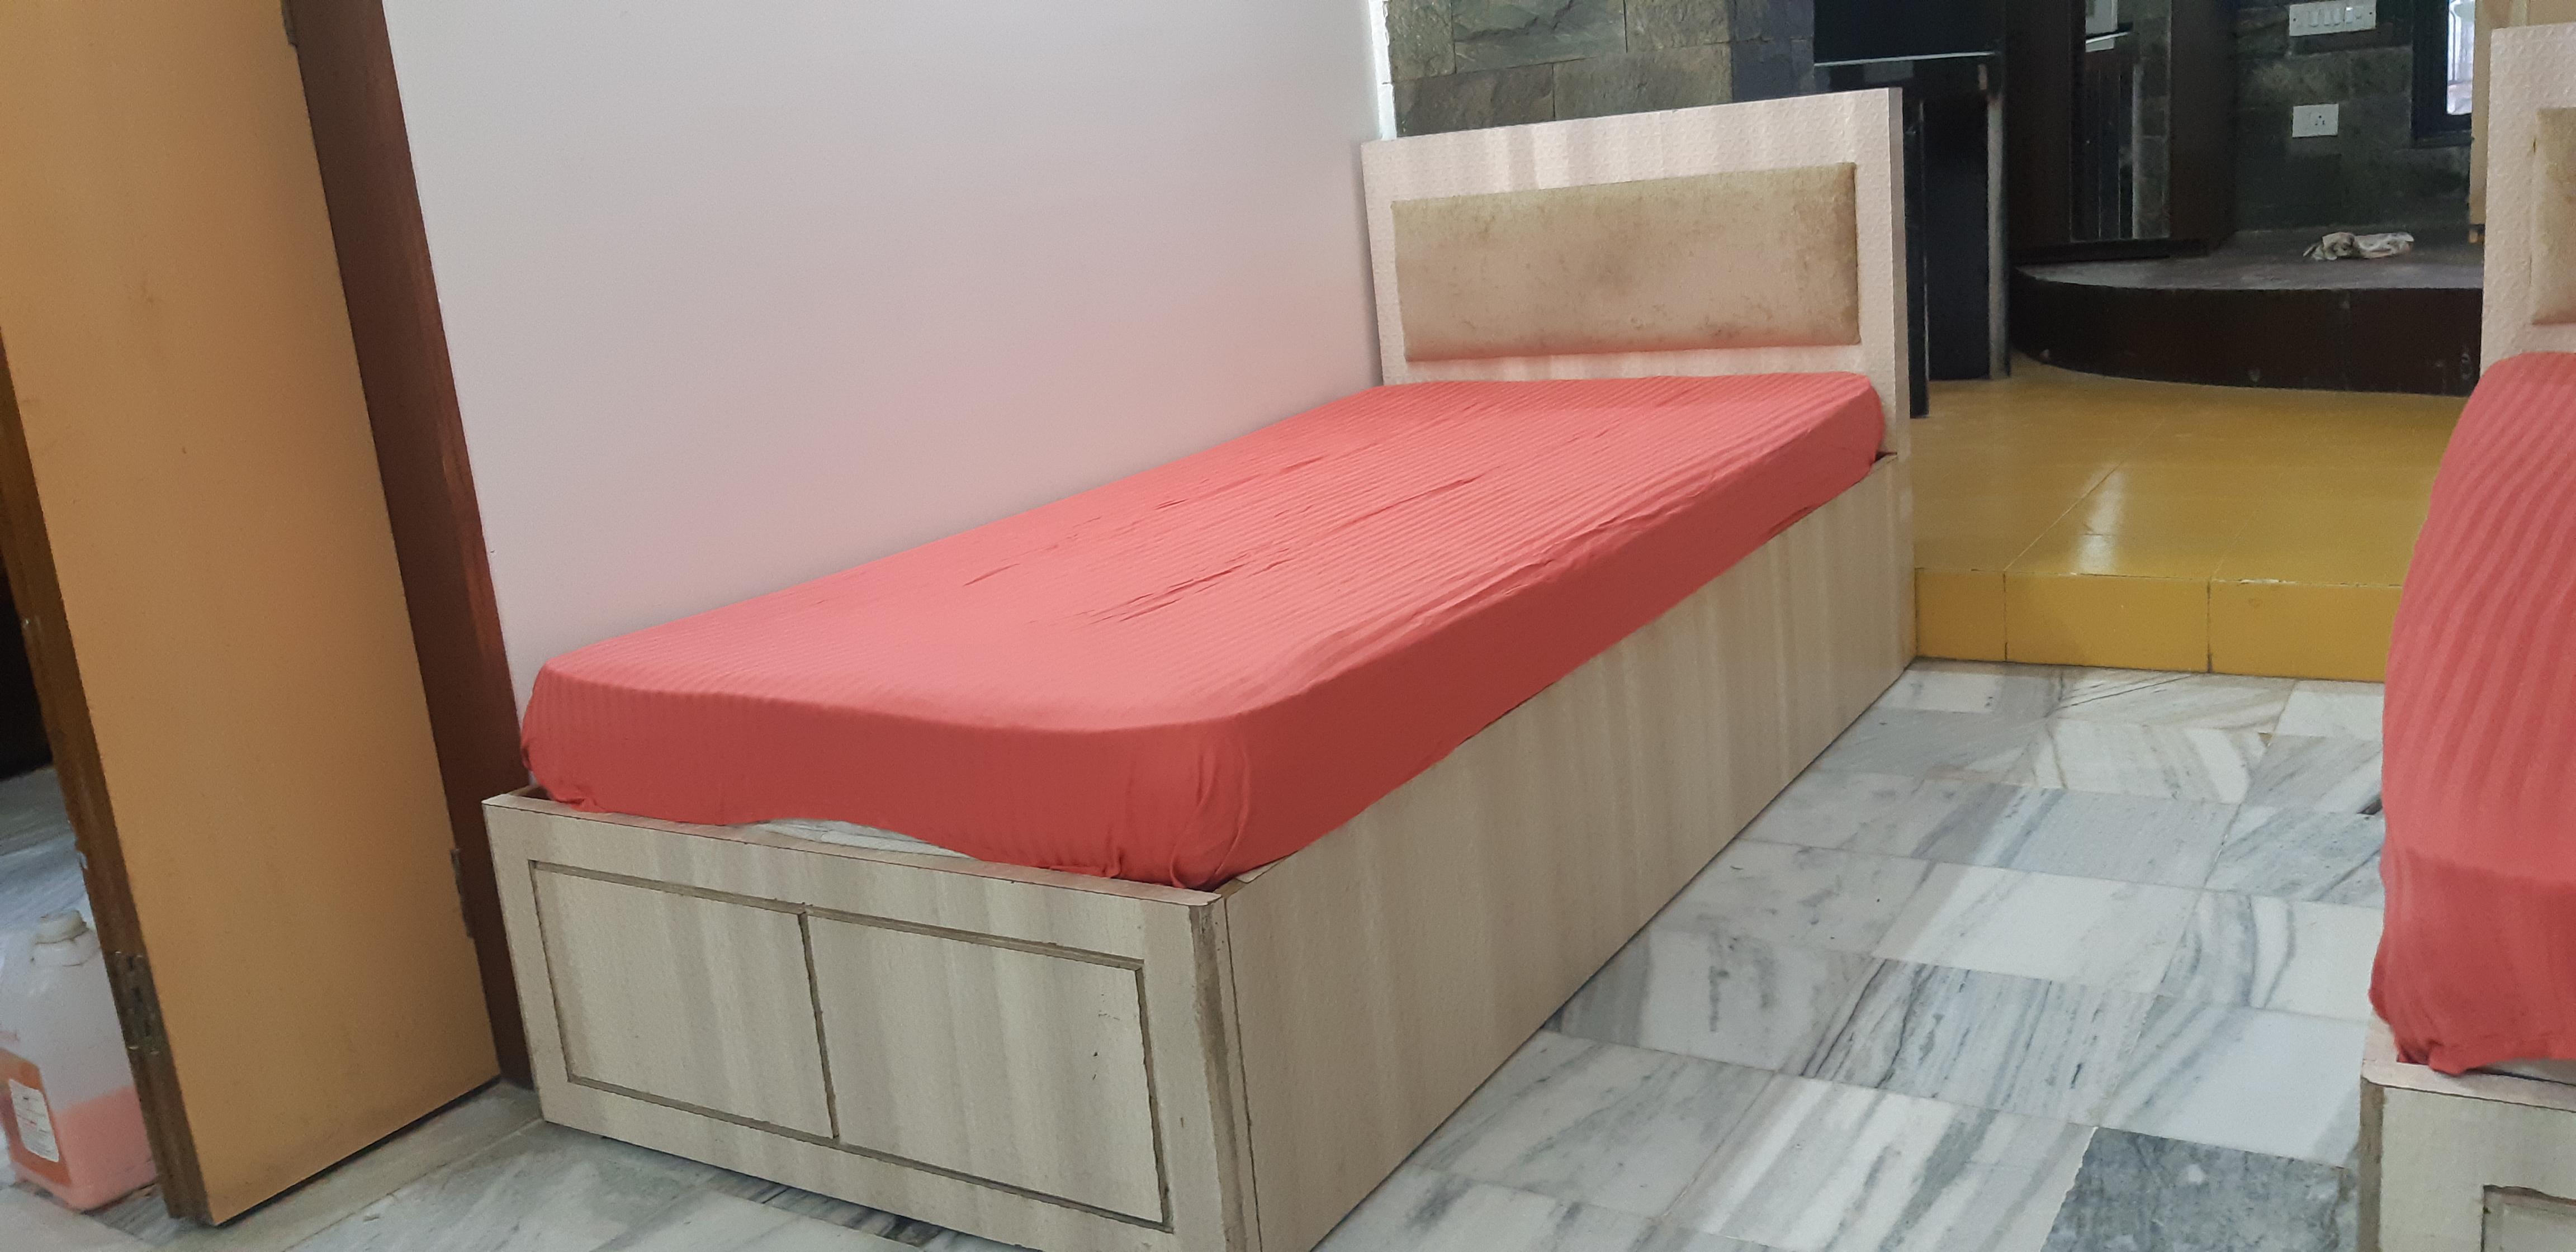 6 Feet long Comfortable Beds